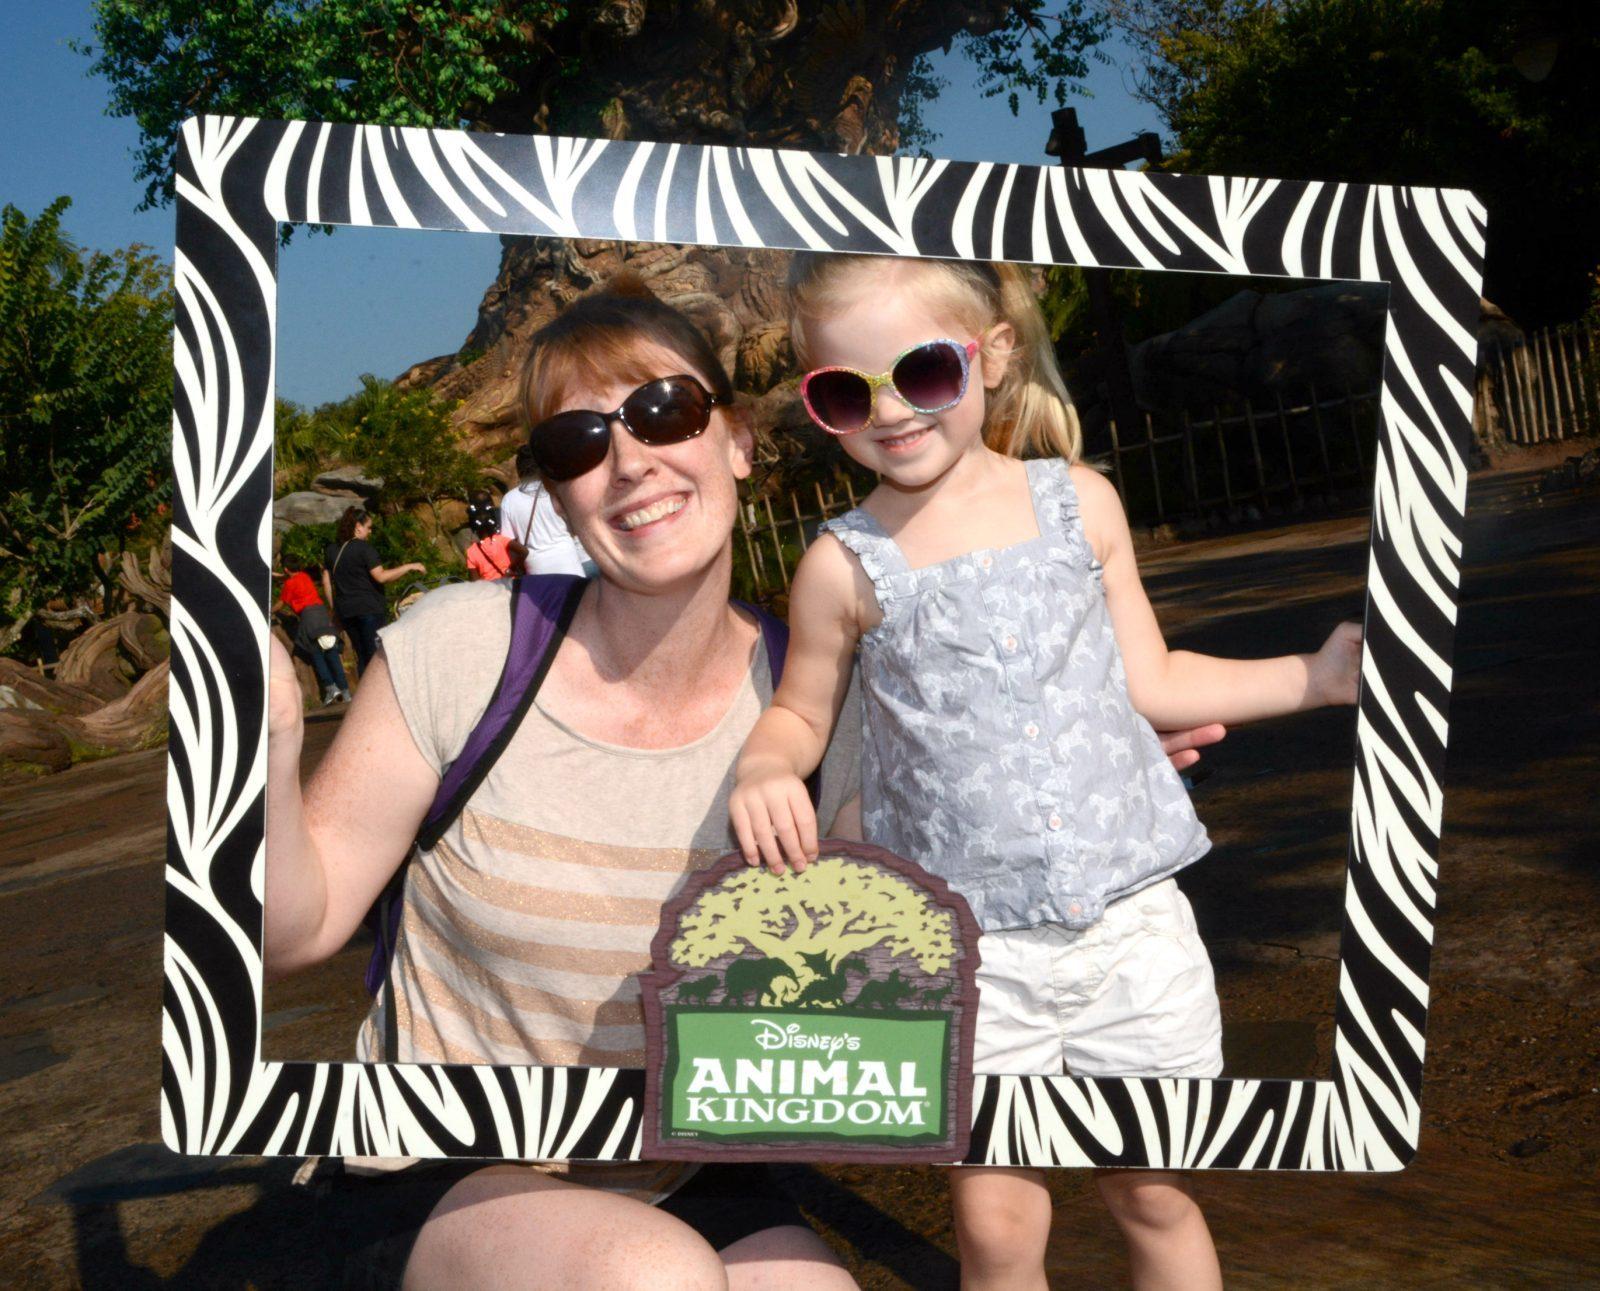 mommy daughter zebra frame photo at animal kingdom